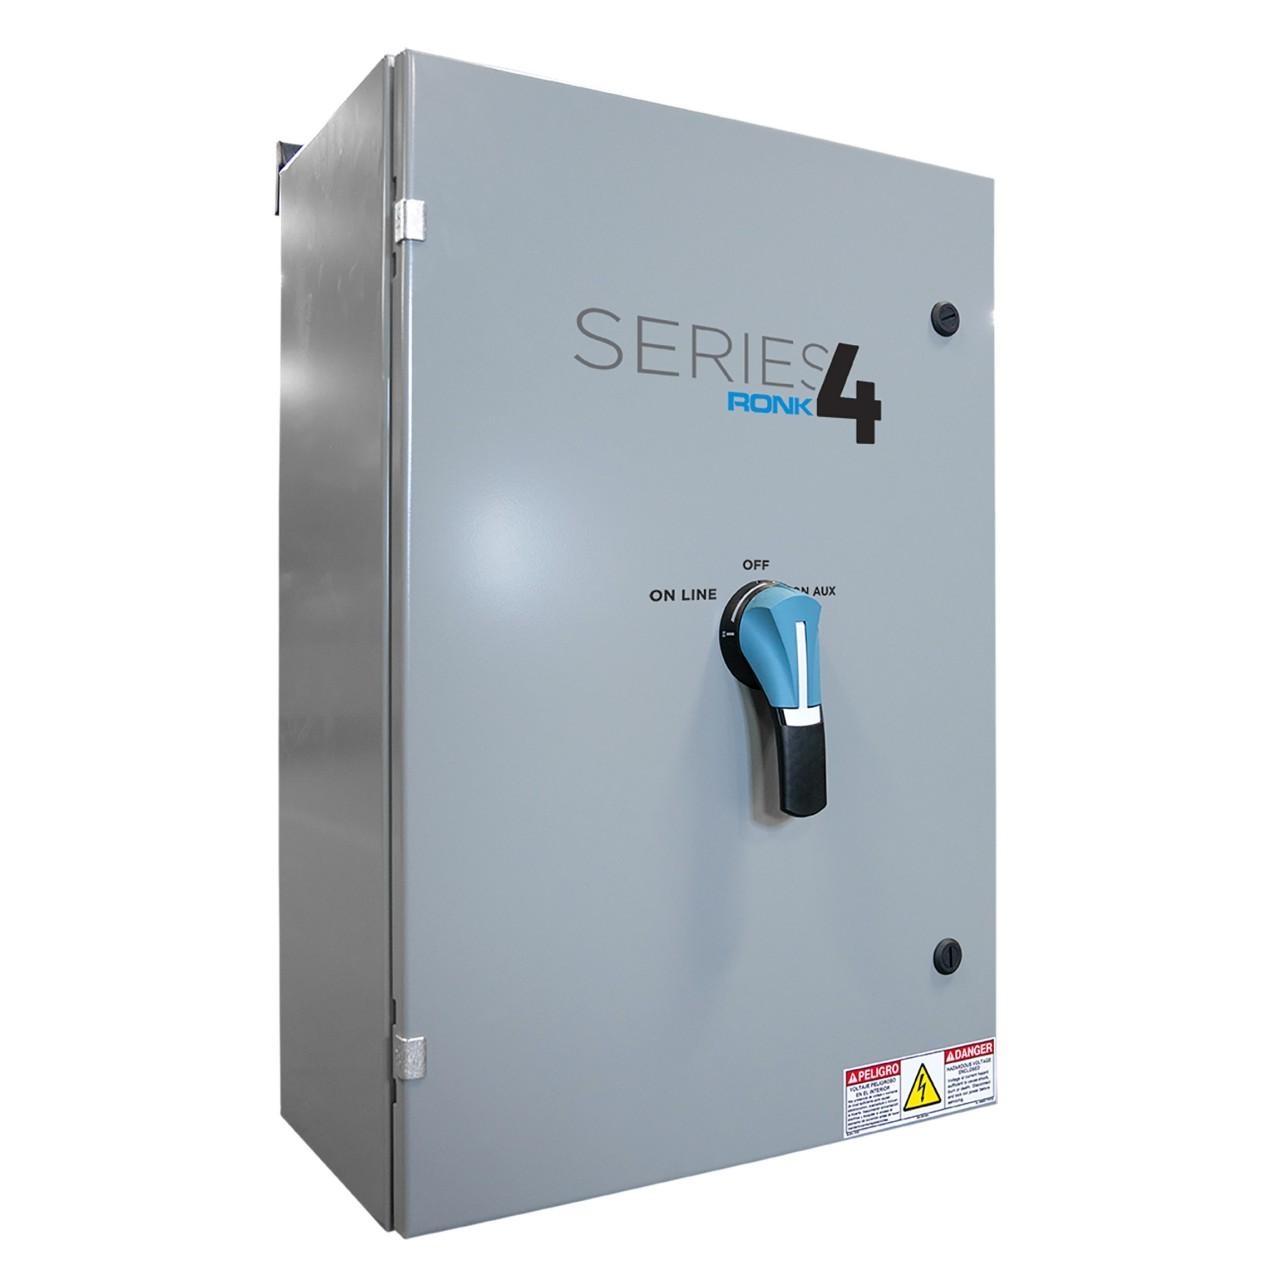 Ronk 4104 Transfer Switch (3Ph, 4-Pole, 100A)